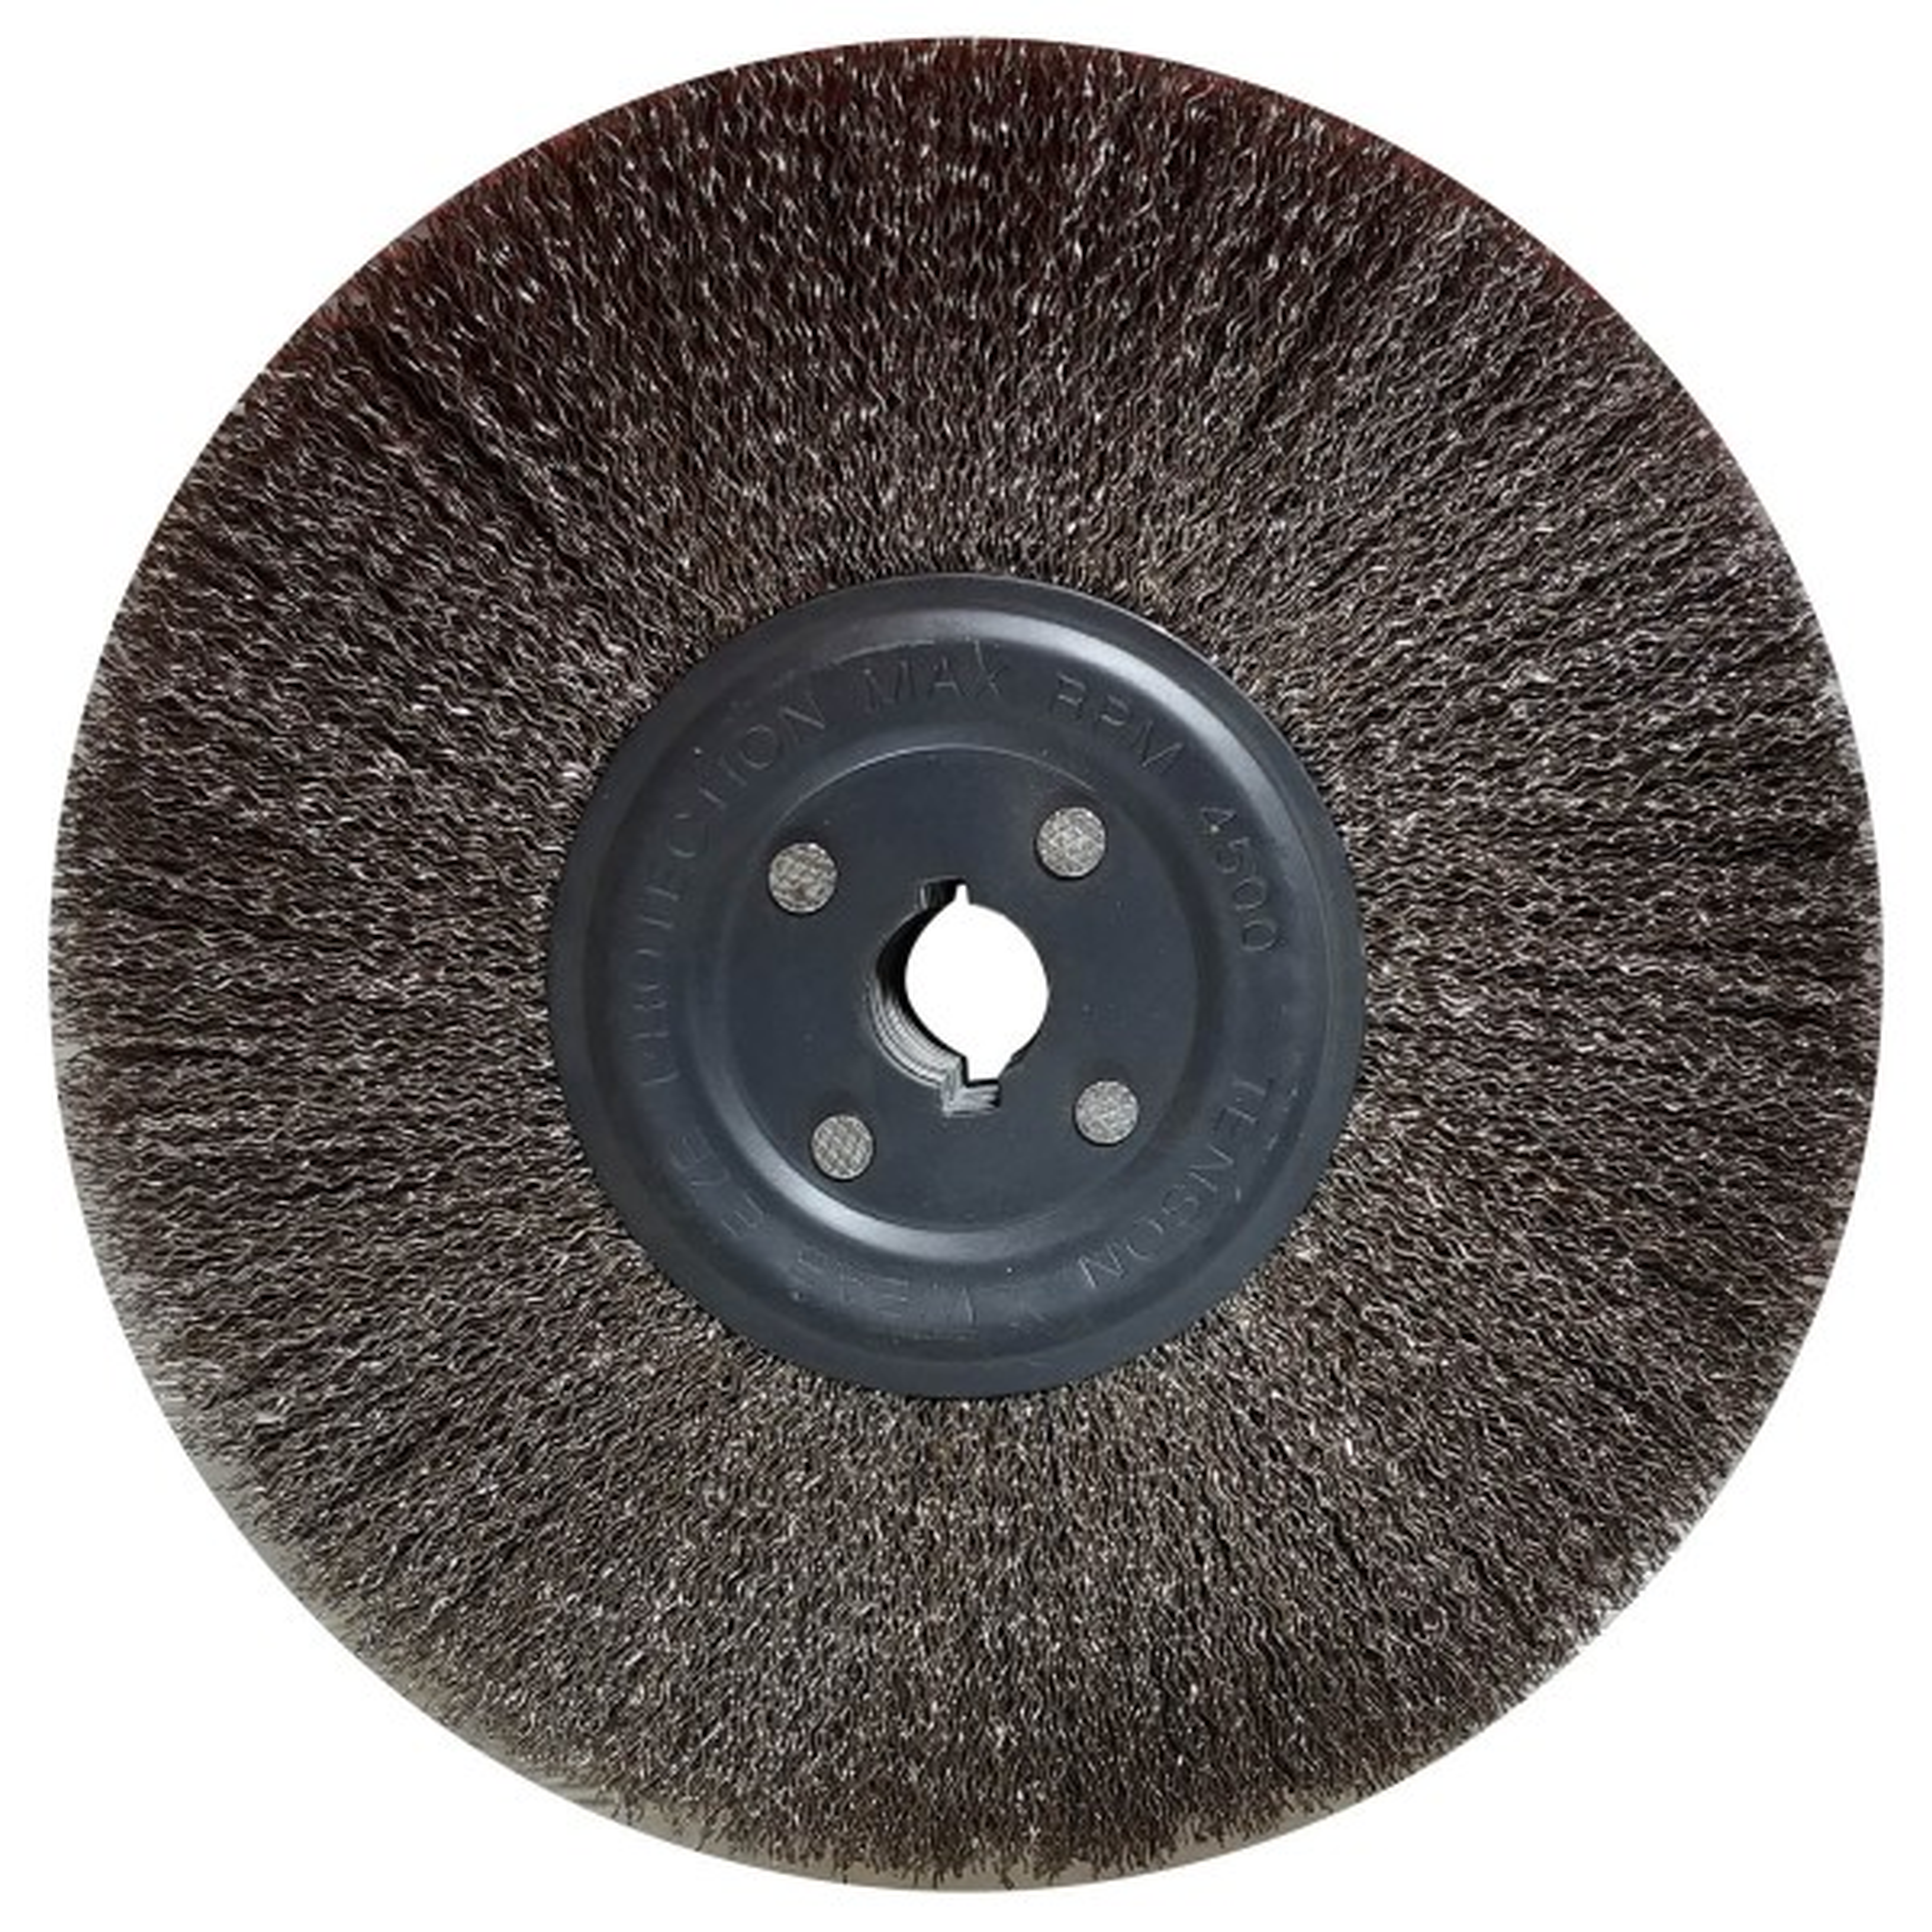 DM-10 Stainless Steel Wire Wheel (DM10-14SS-3)